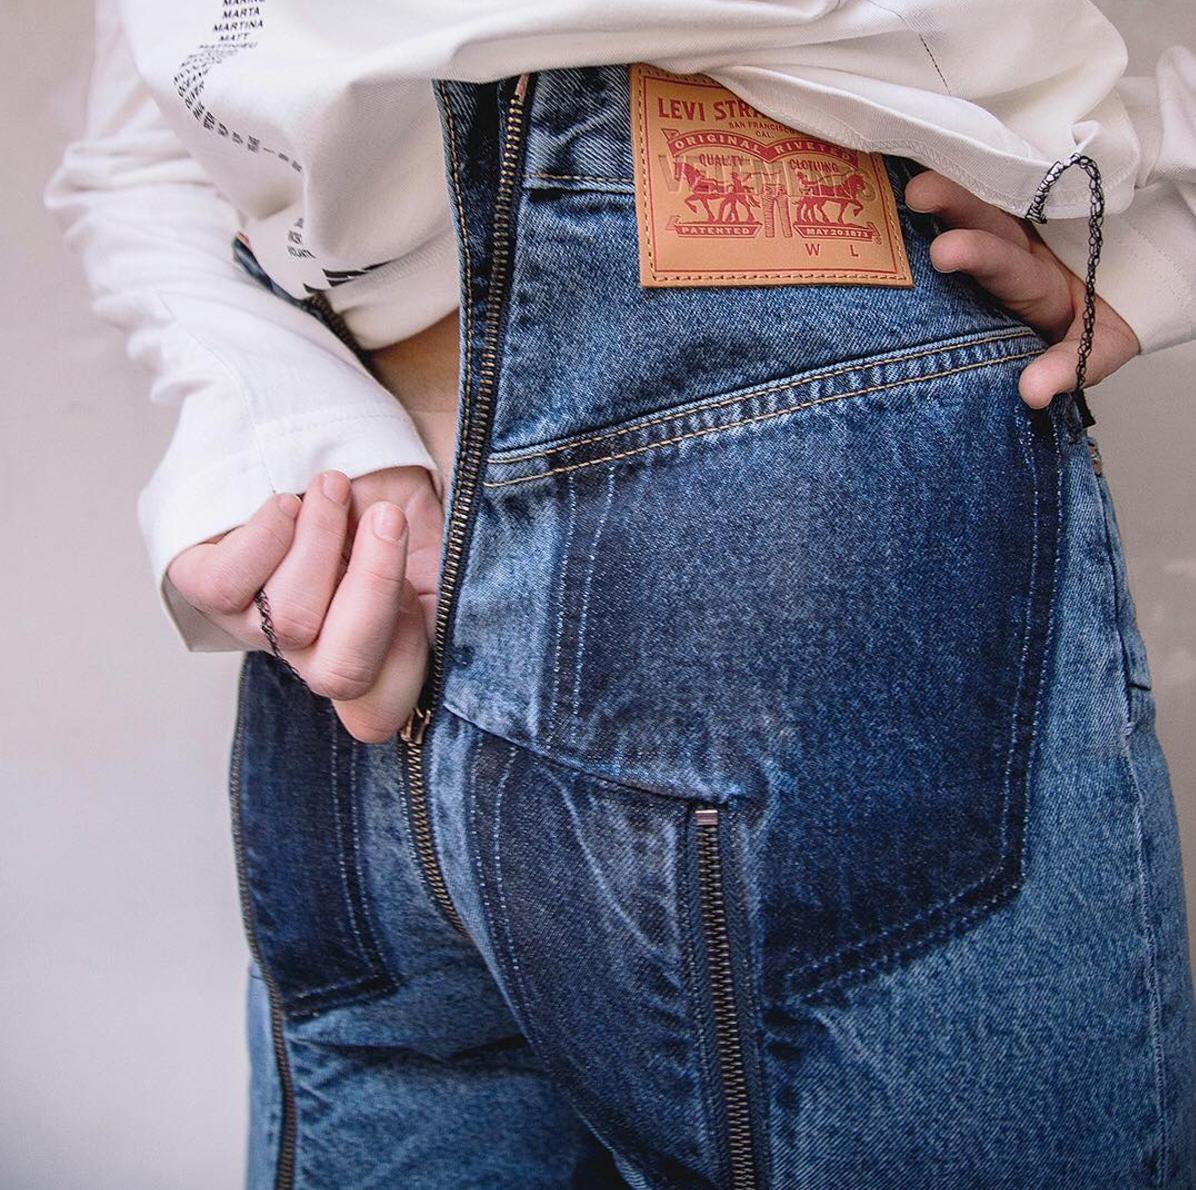 jeans dragkedja bak